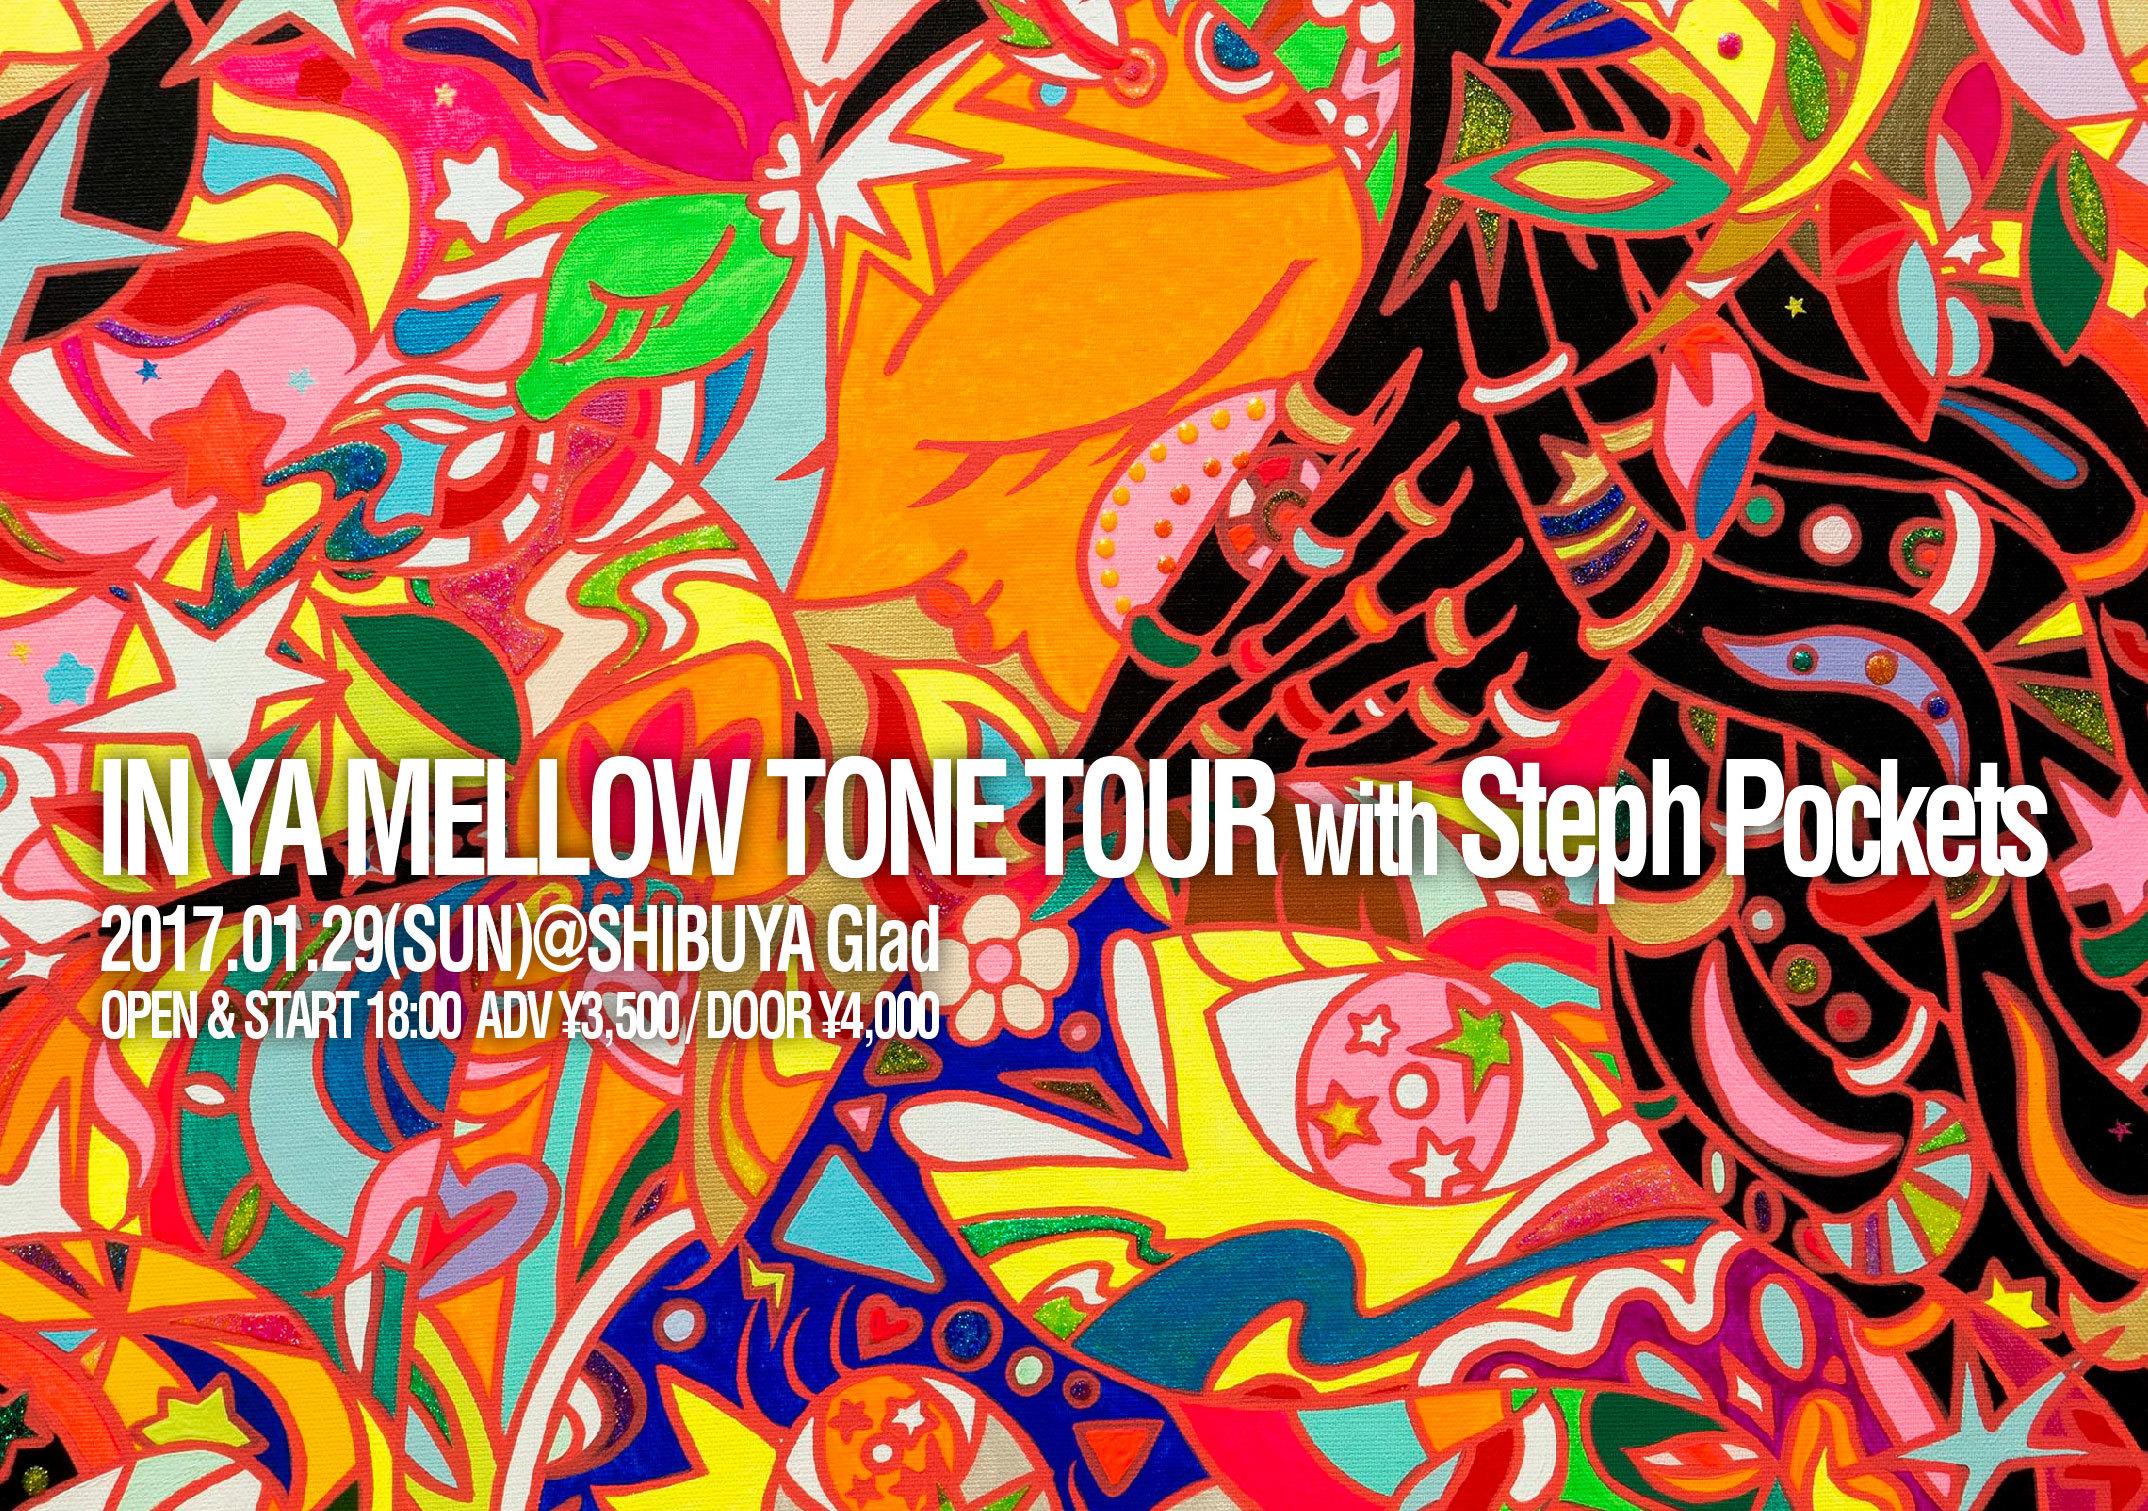 【Steph Pockets JAPAN TOUR Tシャツ&トートバック付プラン】